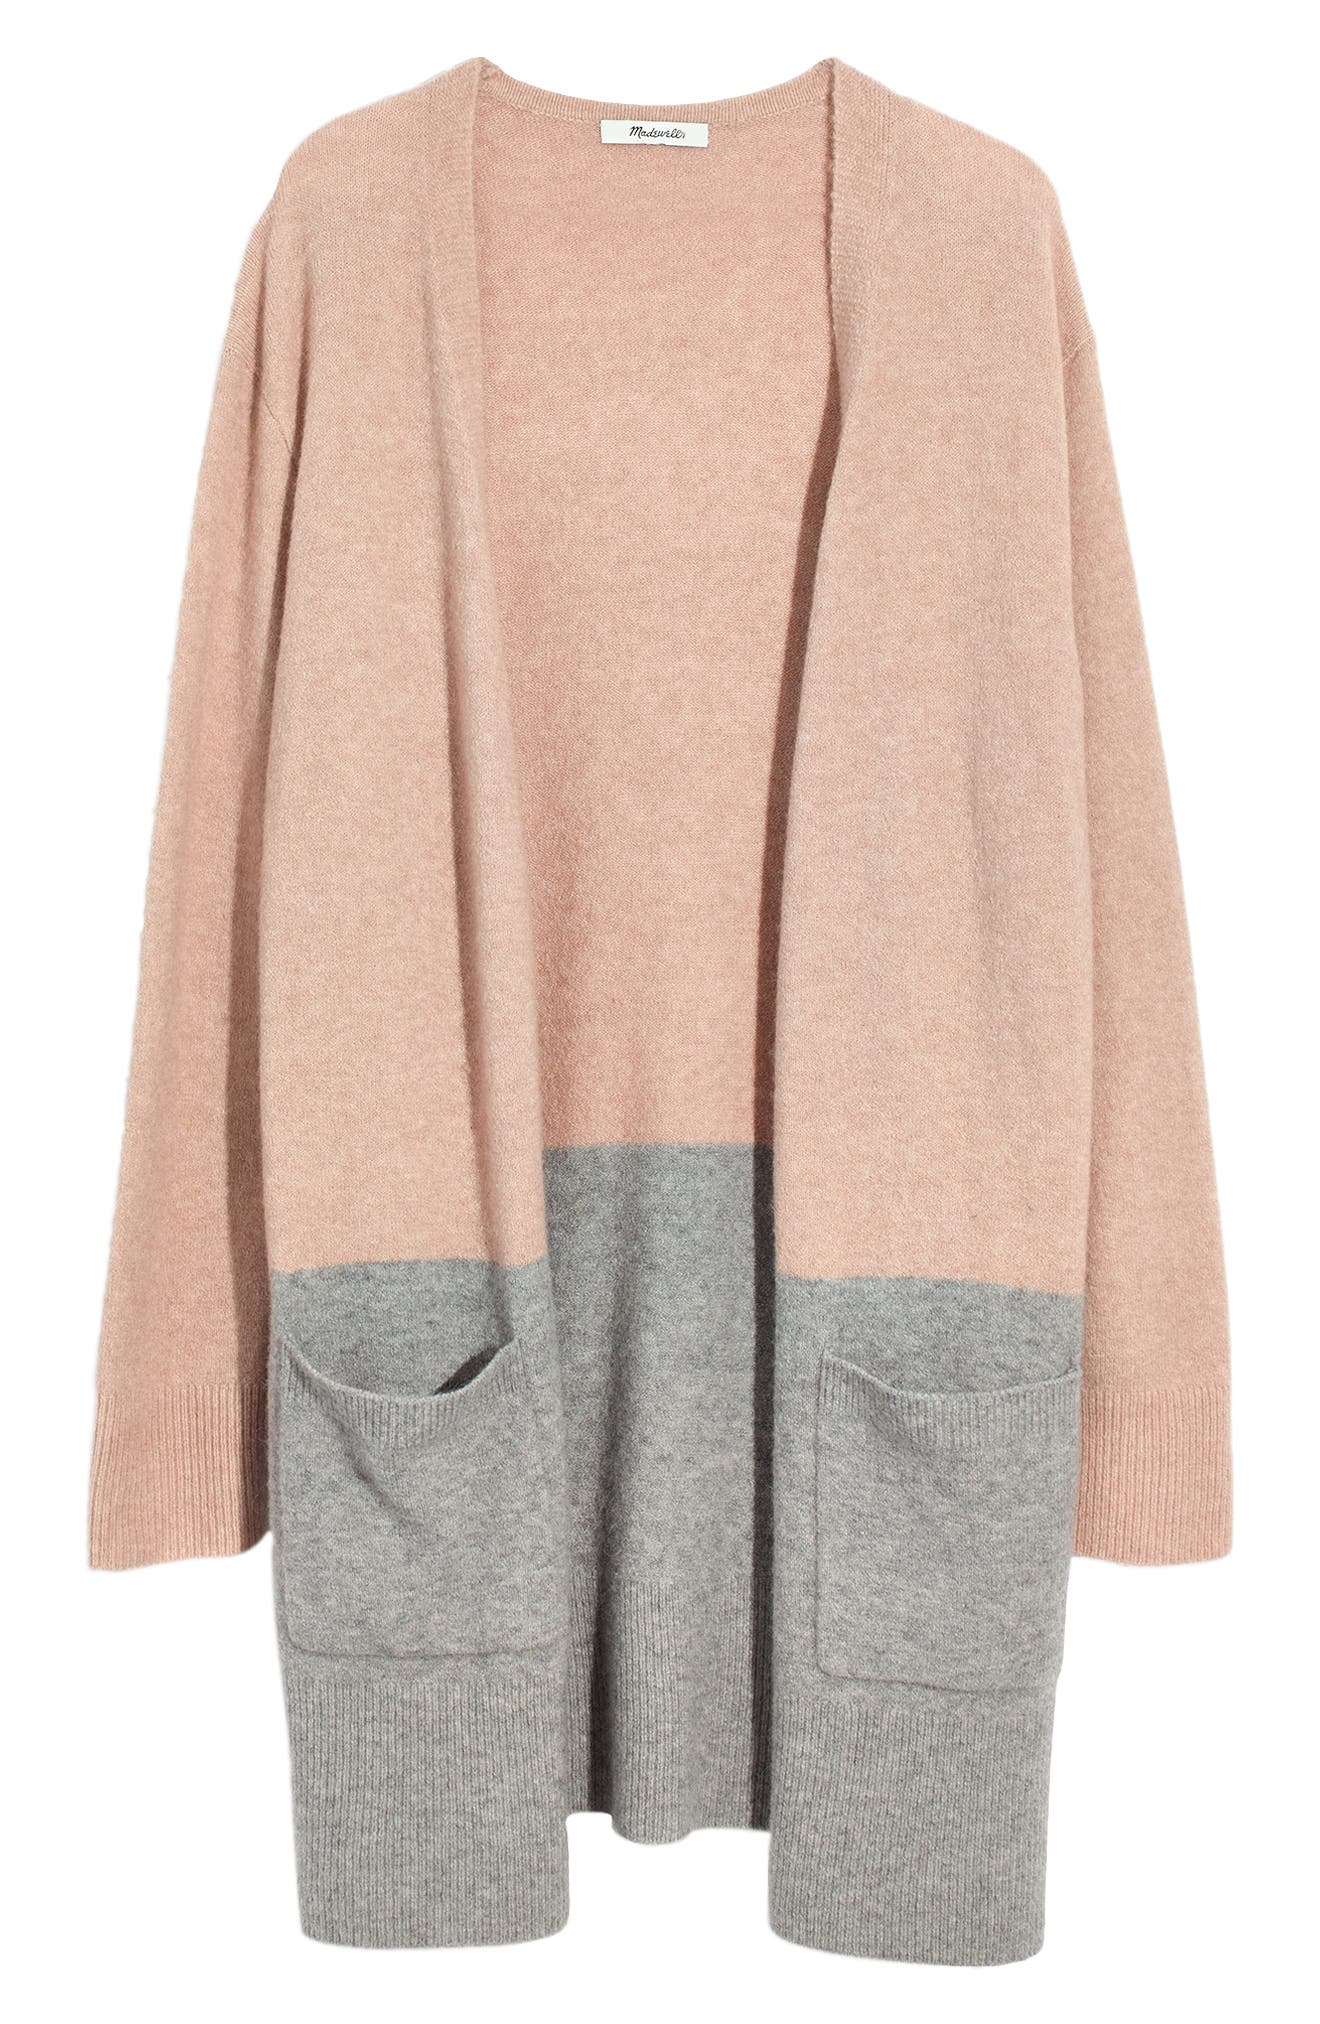 Kent Colorblock Cardigan Sweater,                             Alternate thumbnail 5, color,                             HEATHER BEIGE